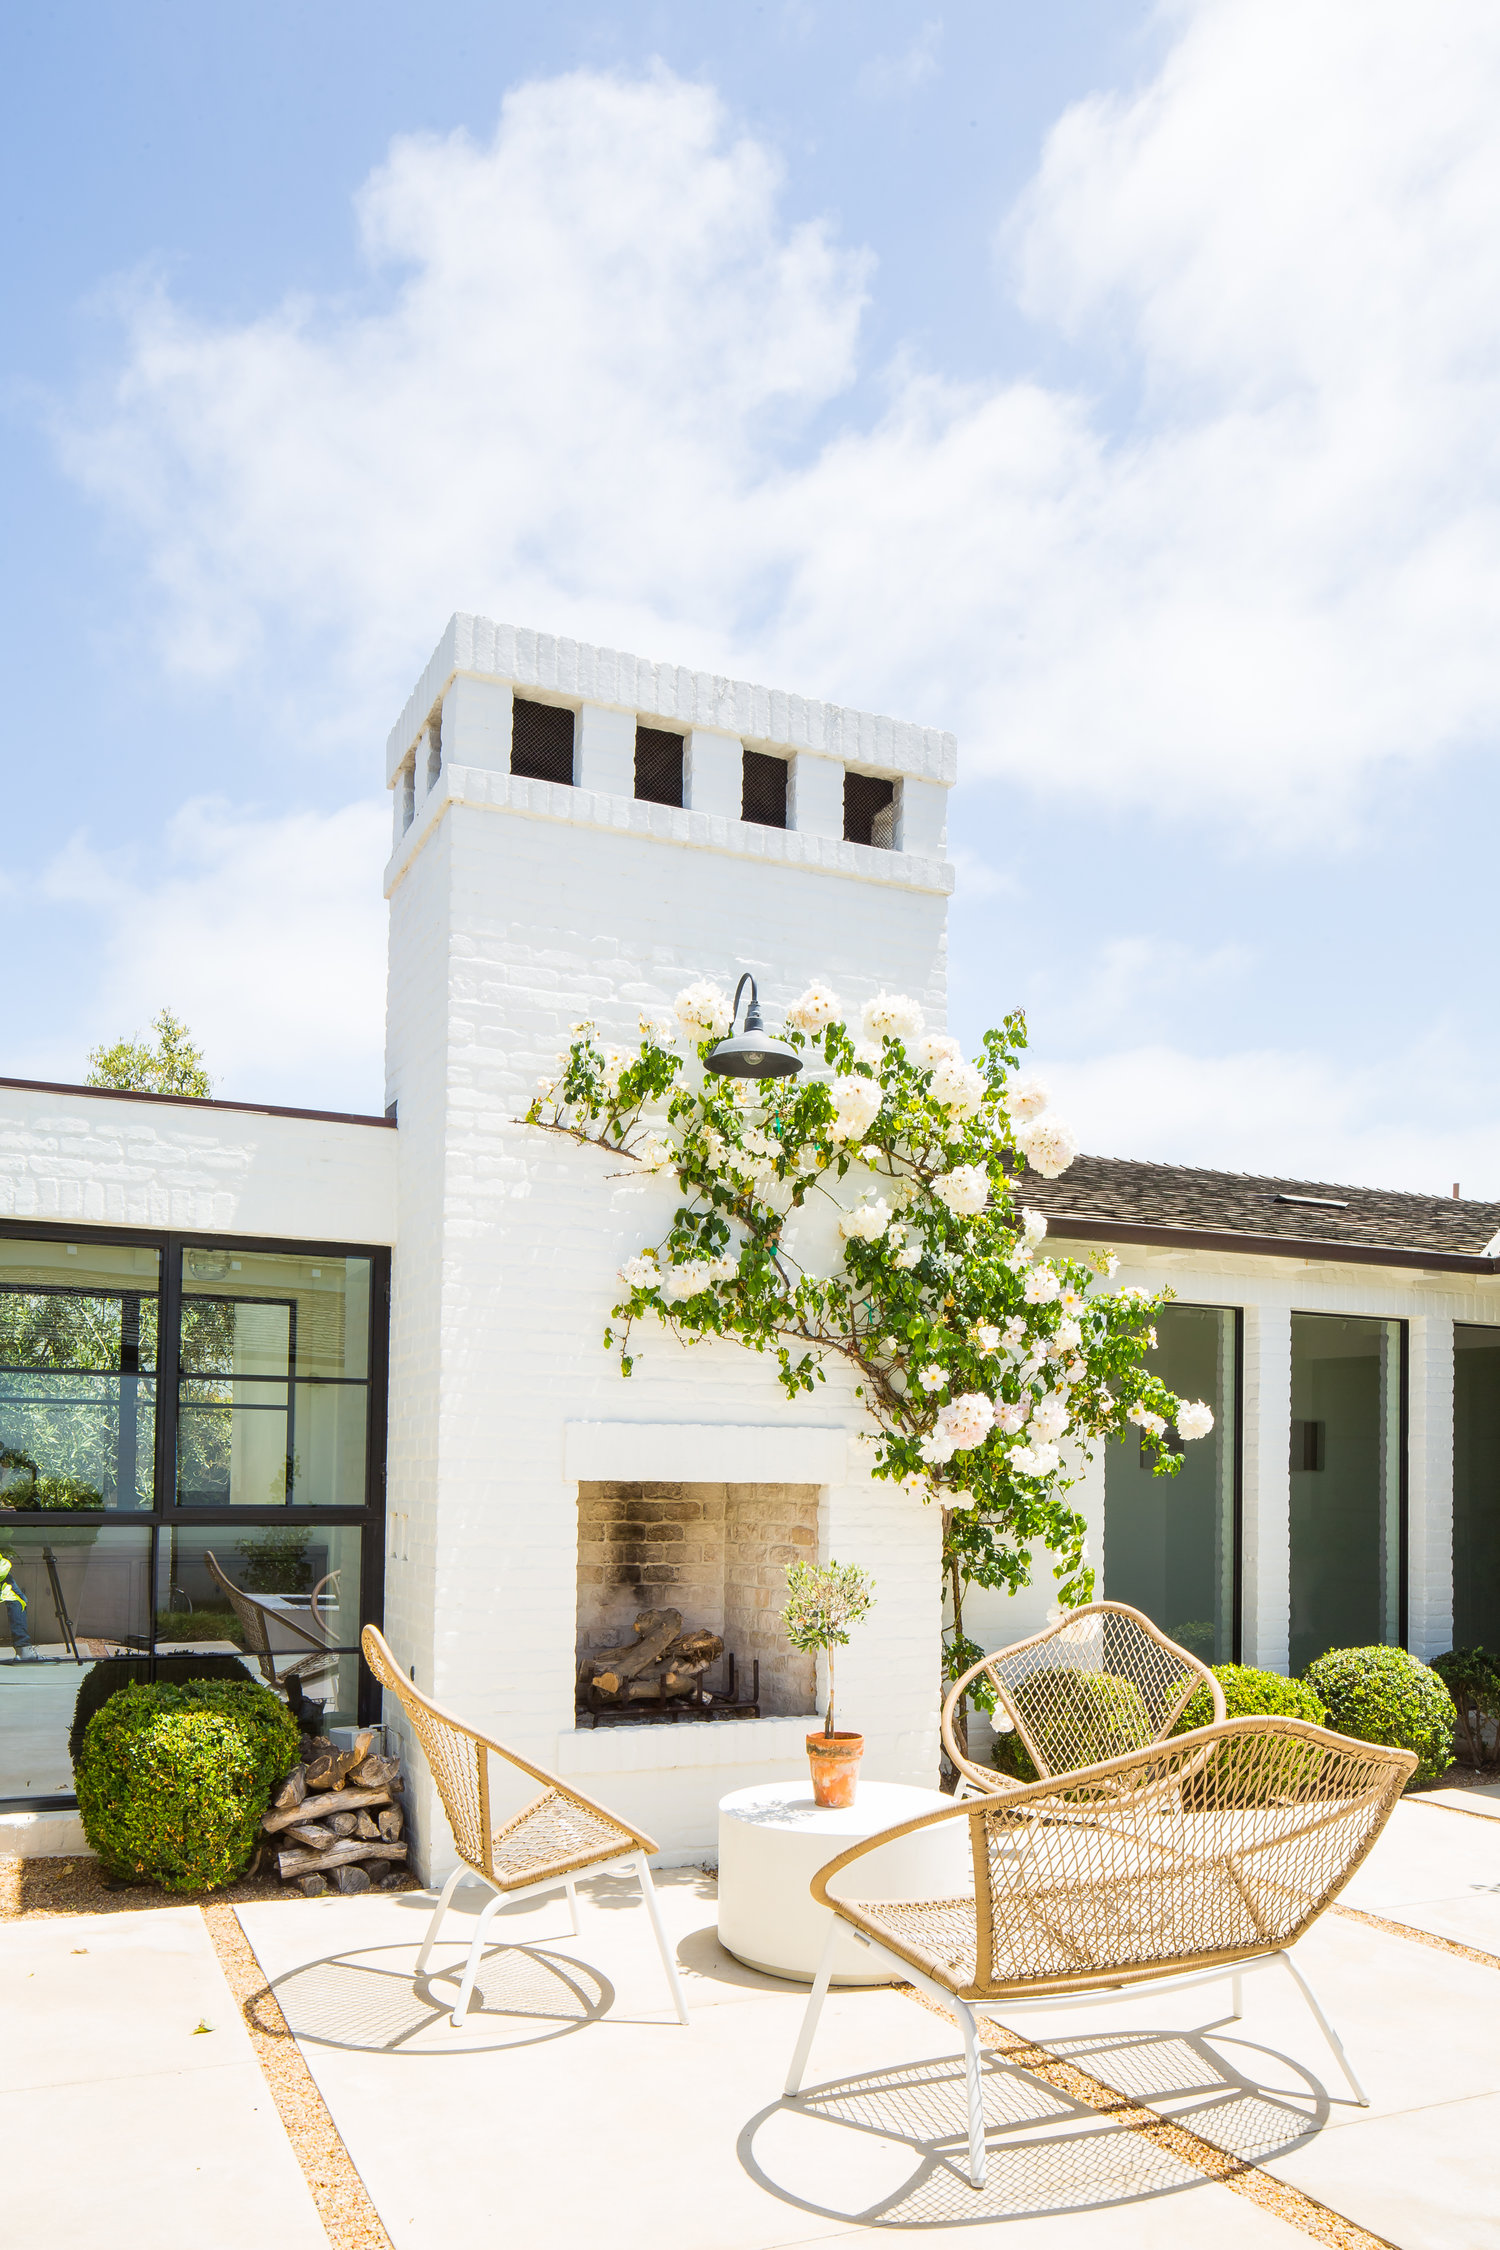 Modern Farmhouse Back Porch with Fireplace - Kelly Nutt Design.jpg